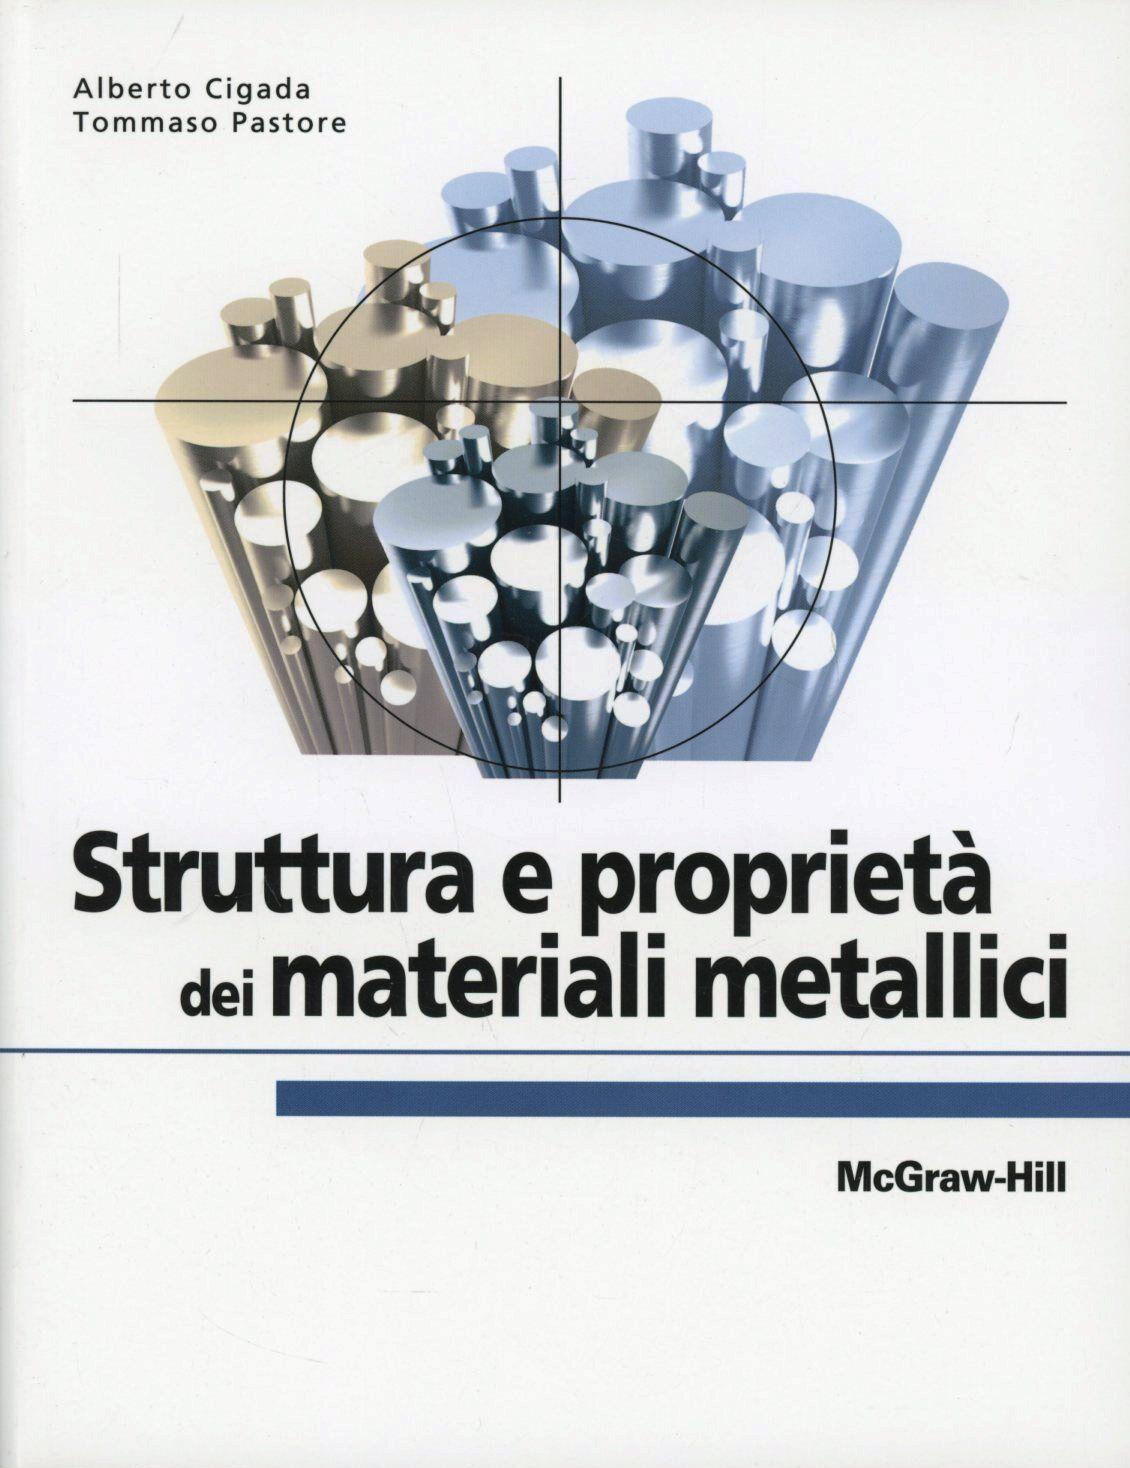 Struttura e proprietà dei materiali metallici